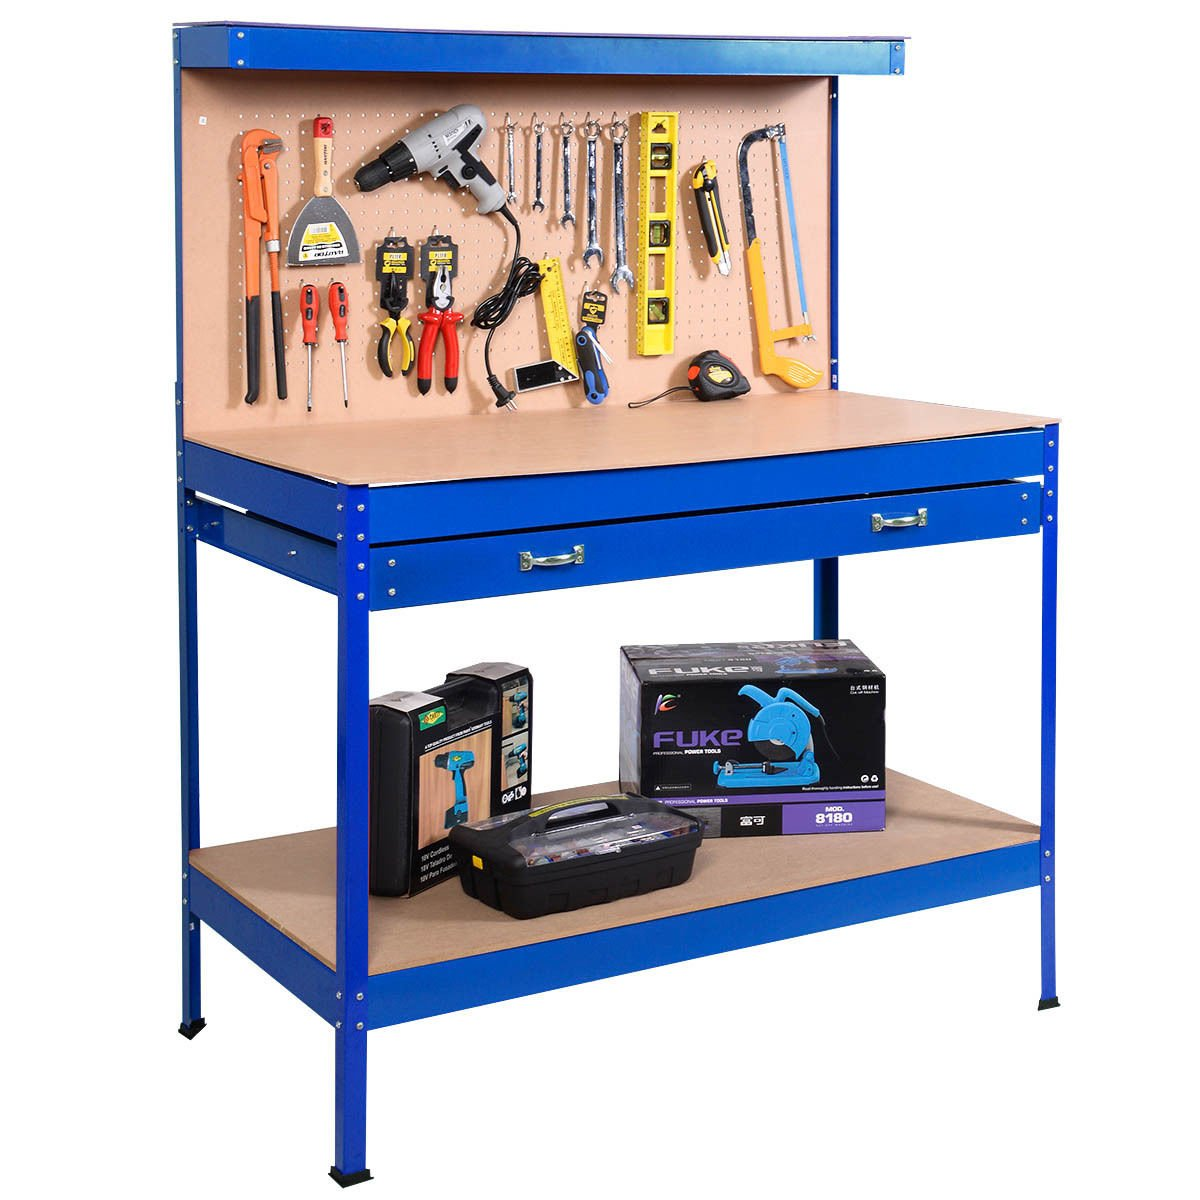 allgoodsdelight365 Blue Work Bench Tool Storage Steel Tool Workshop Table W/Drawer and Peg Board Bonus free ebook By